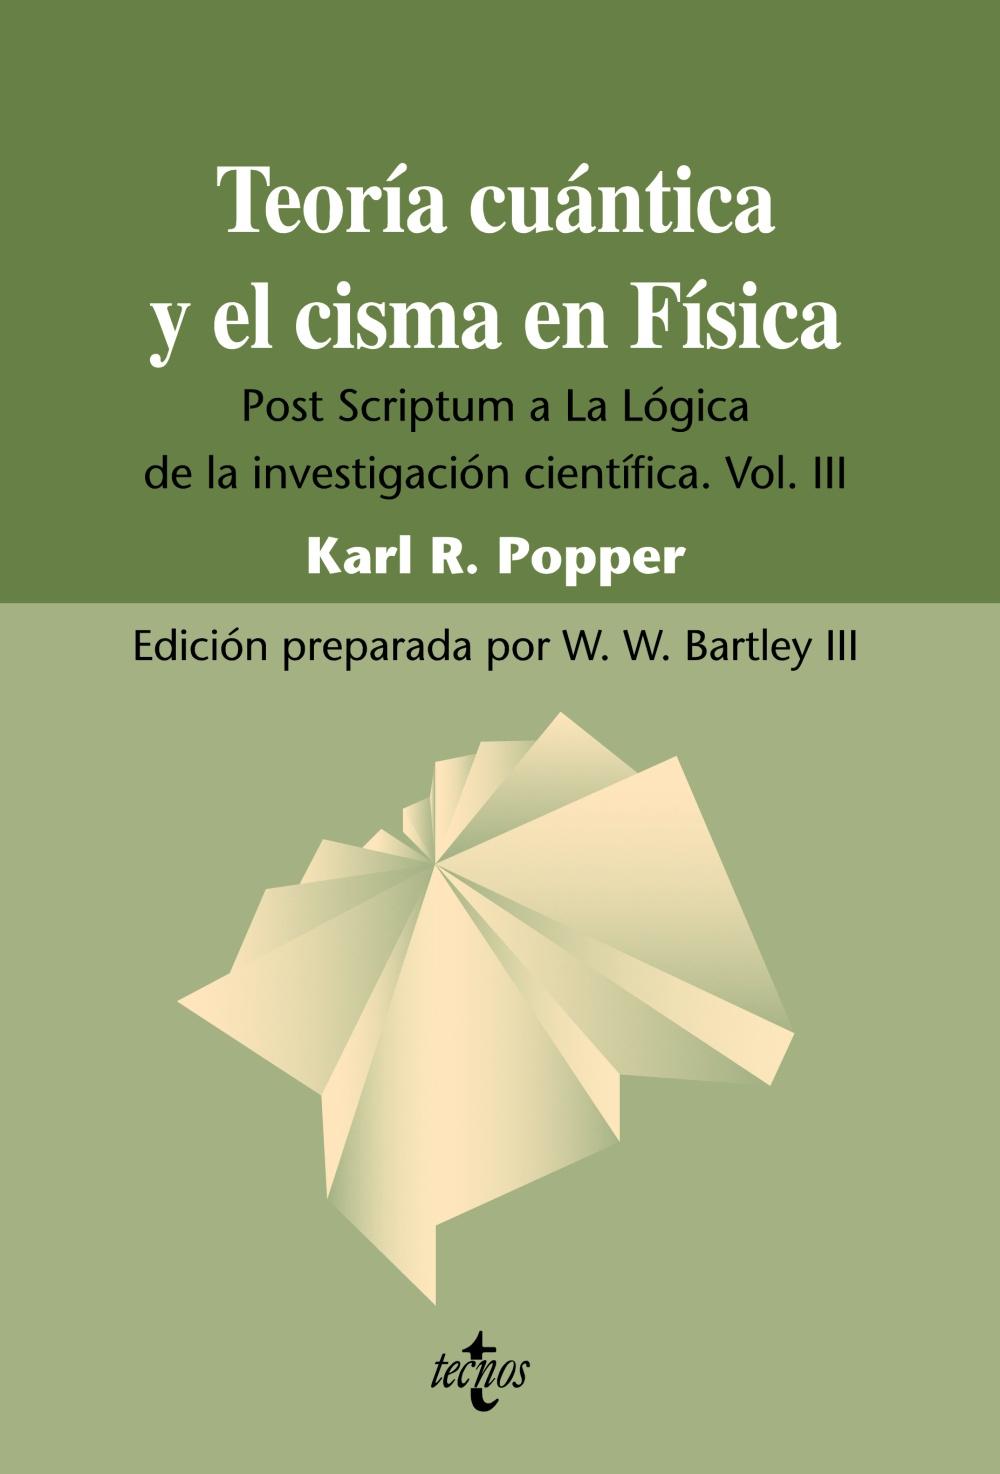 teoria cuantica y el cisma de la fisica: post scriptum a la logic a de la investigacion cientifica. vol. iii (3ª ed.)-karl r. popper-9788430950720